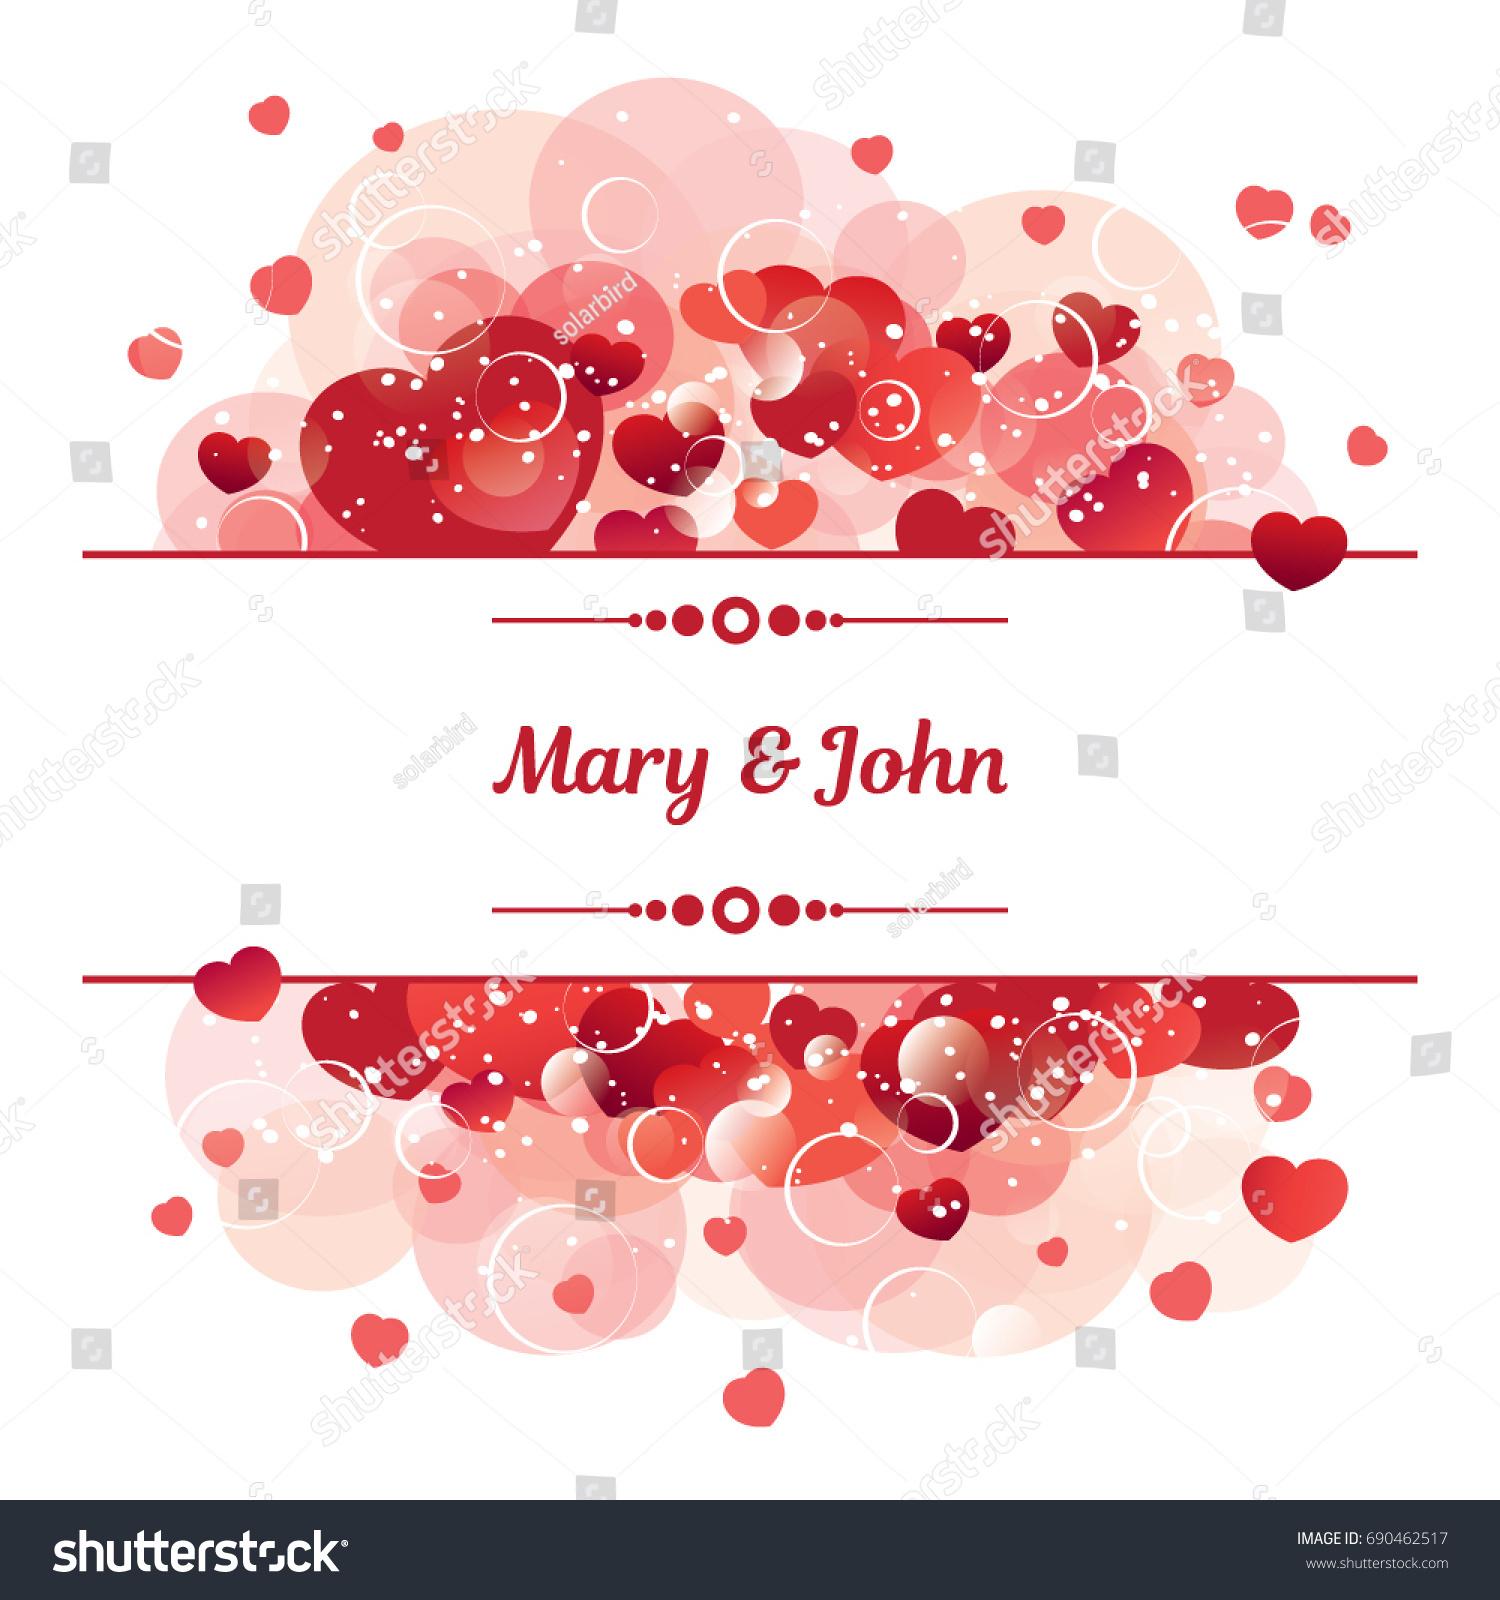 Vector Design Wedding Invitation Love Hearts Stock Vector (Royalty ...